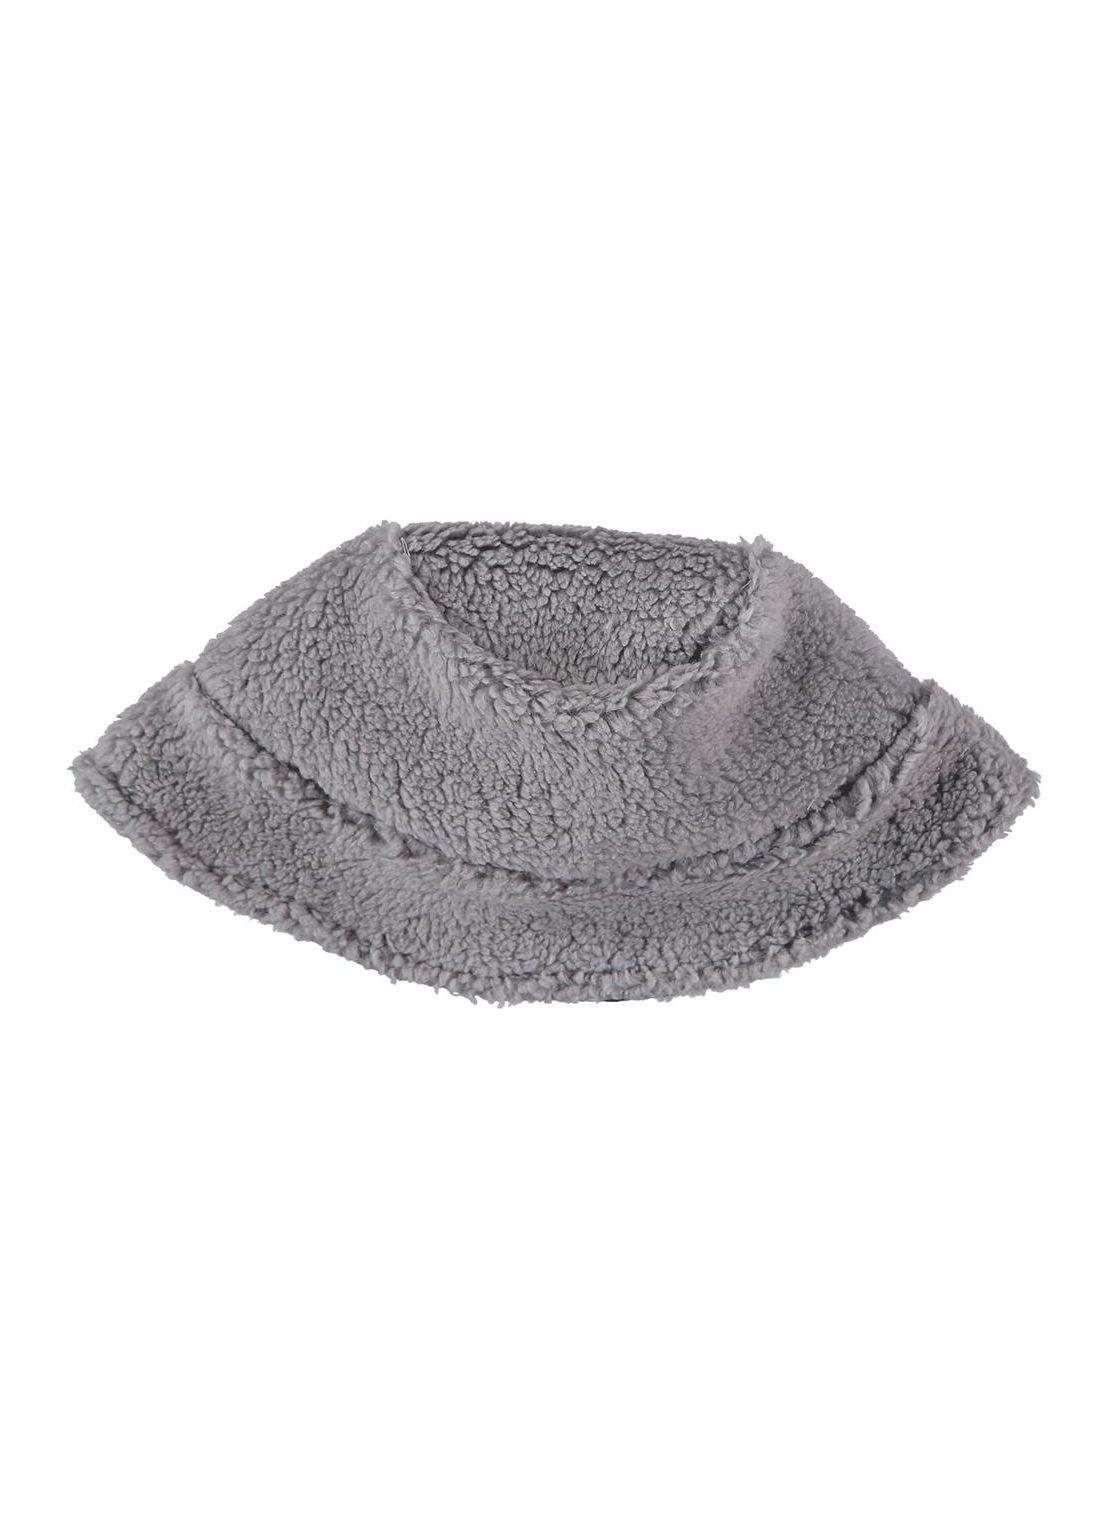 Baby CAP Unisex-Unisex-83% Cotton 17% polester